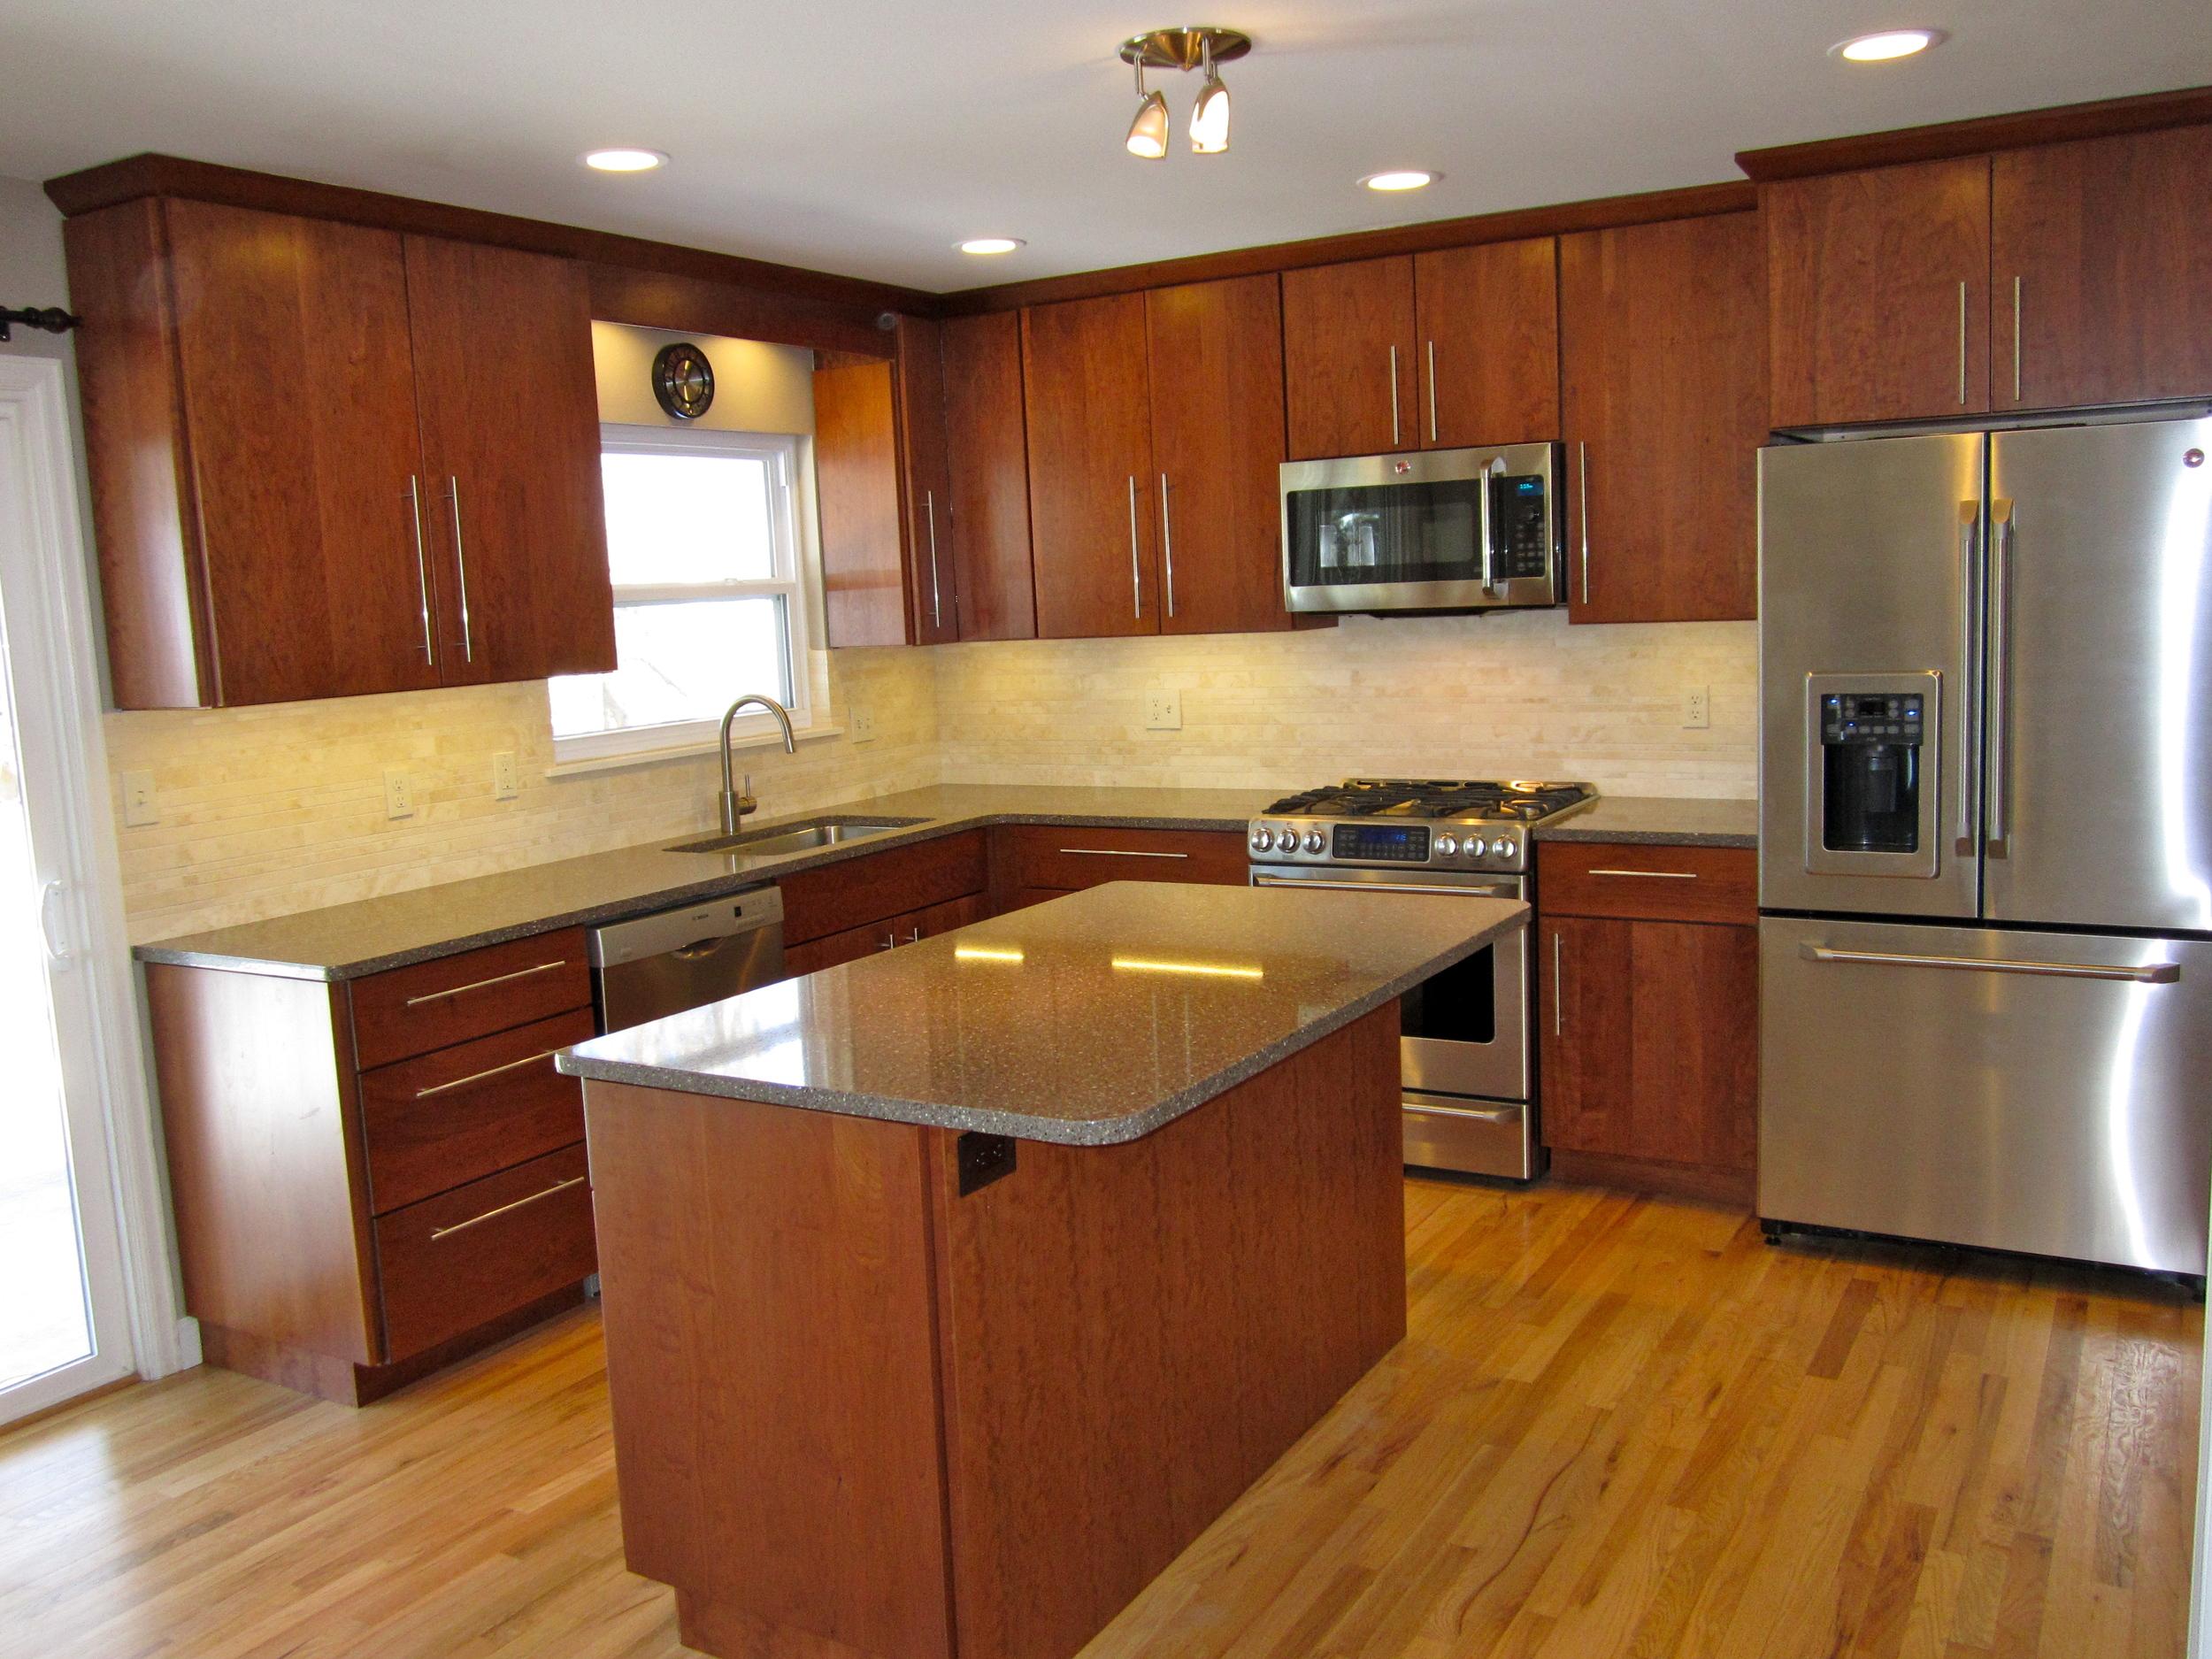 kitchens 15.jpg